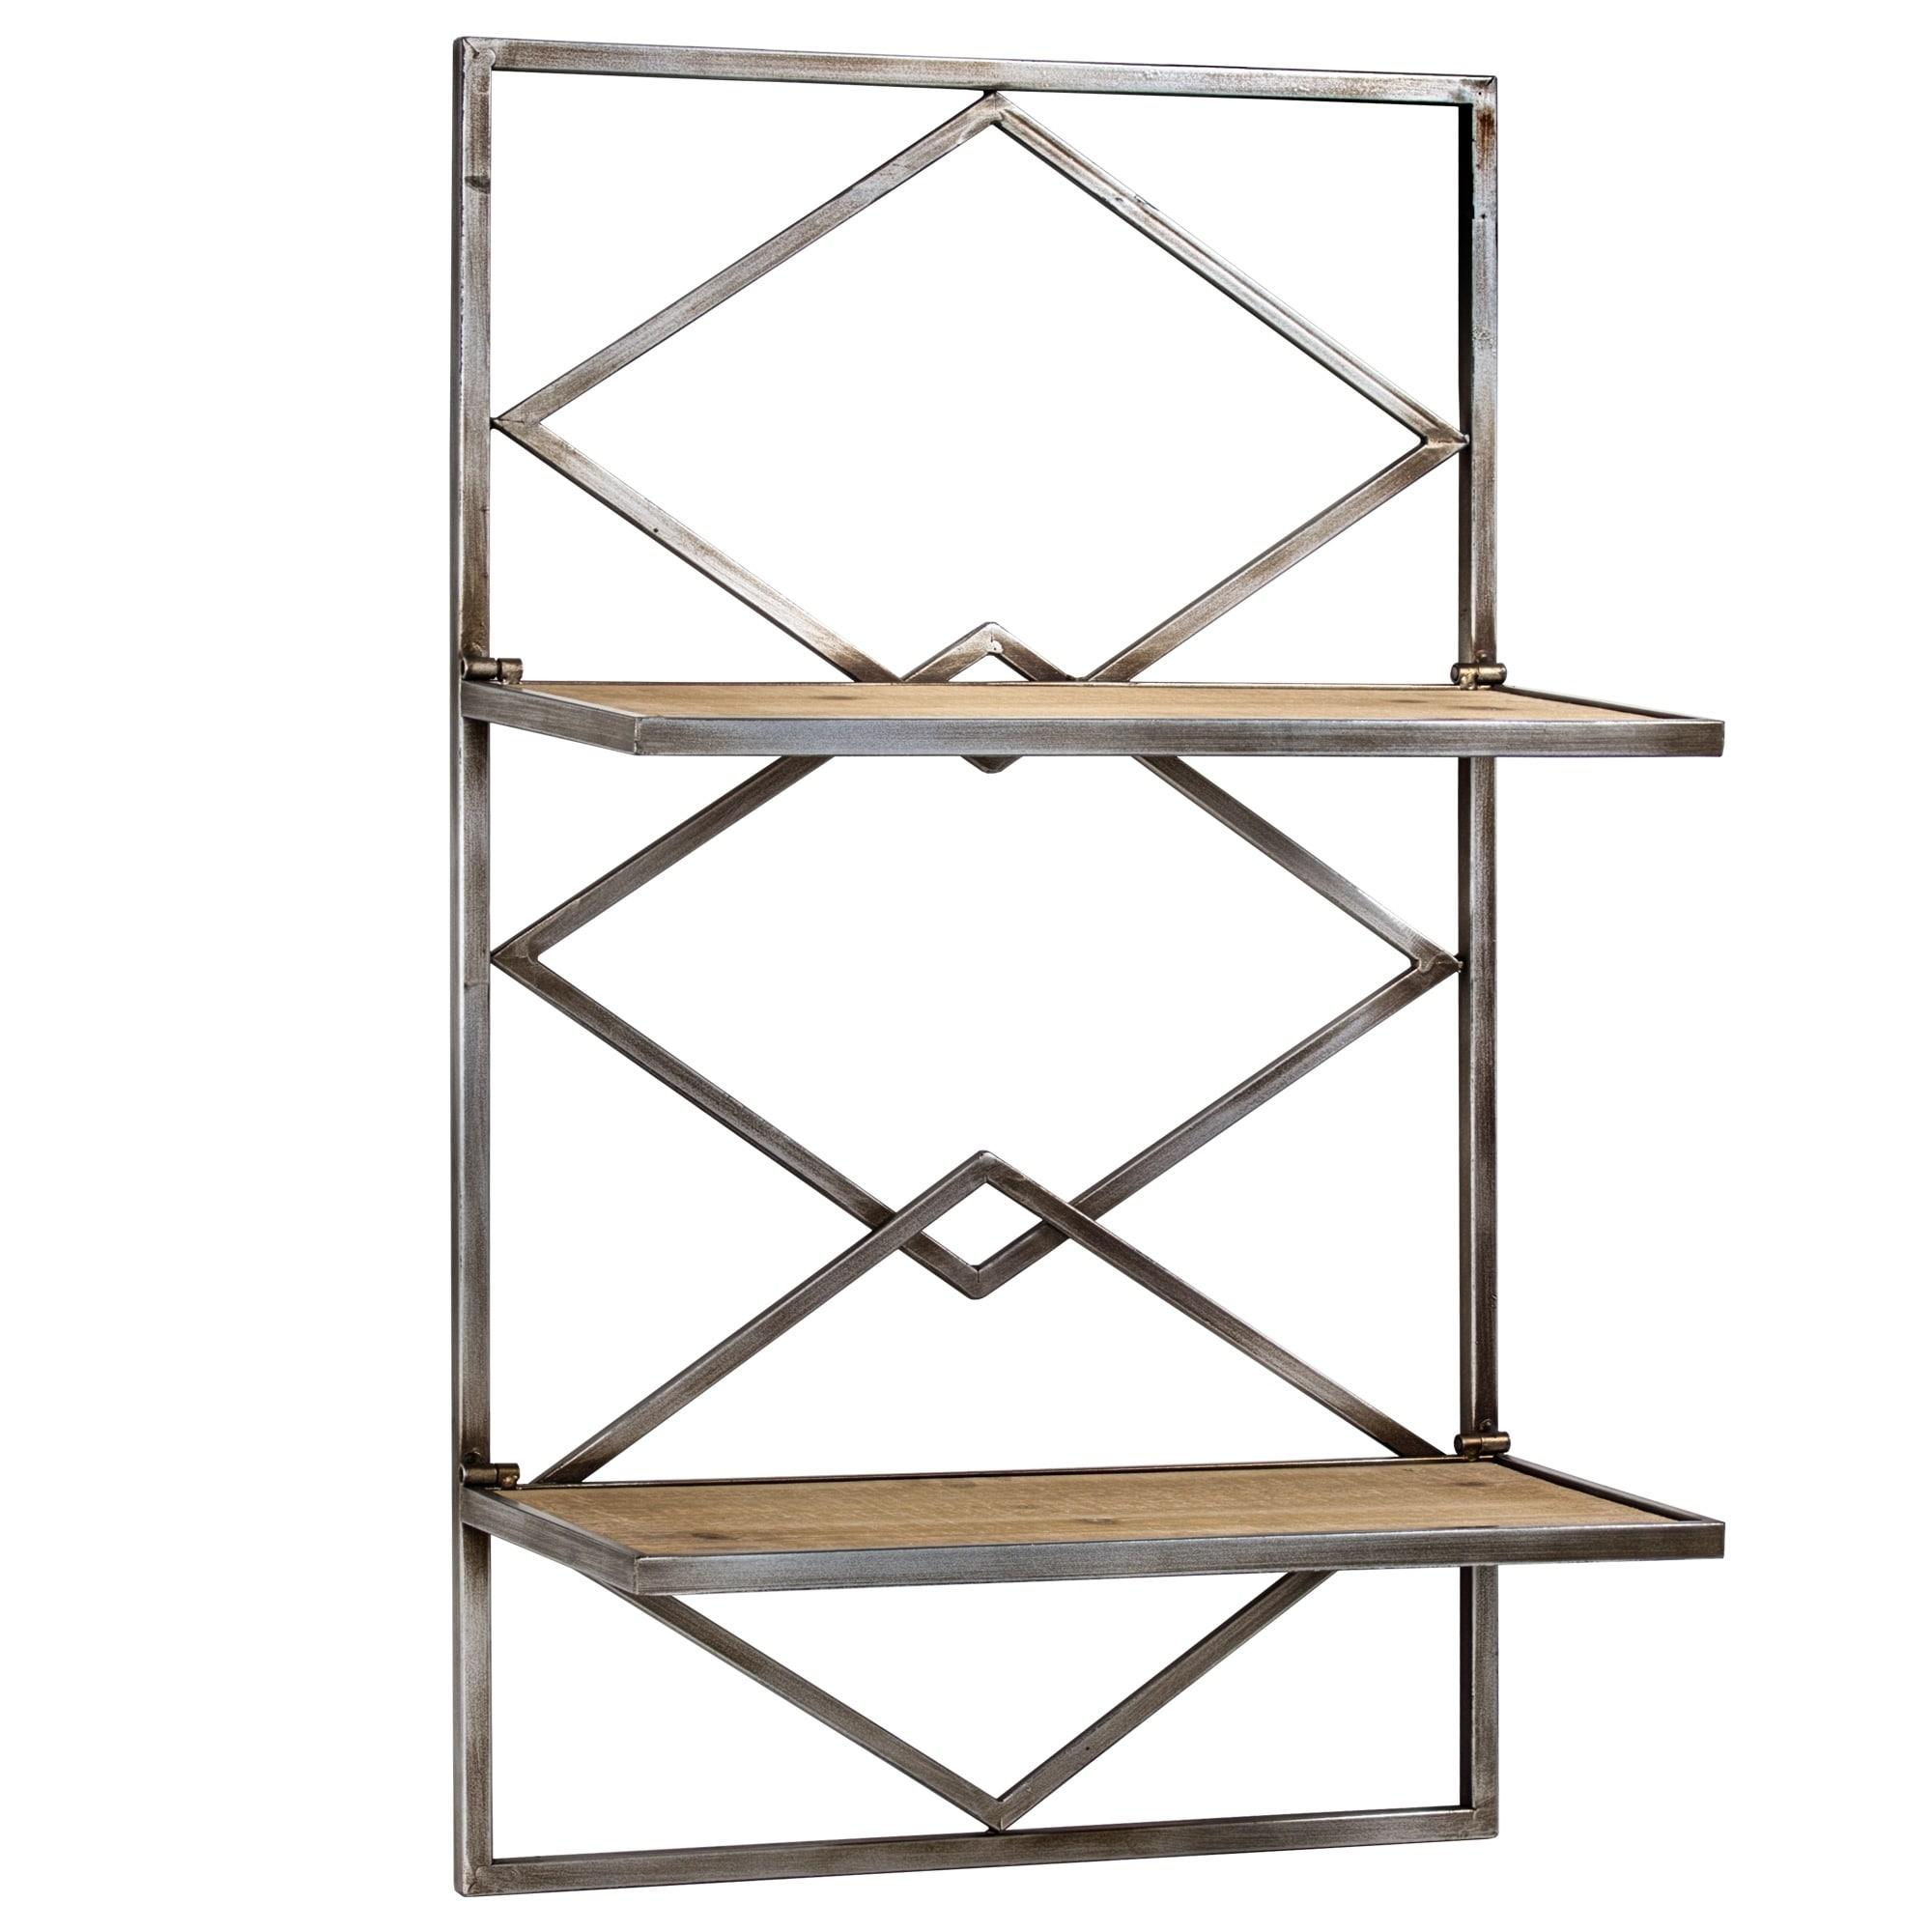 American Art Decor Wood And Metal Hanging Shelf Rack Free Shipping Today 20784621